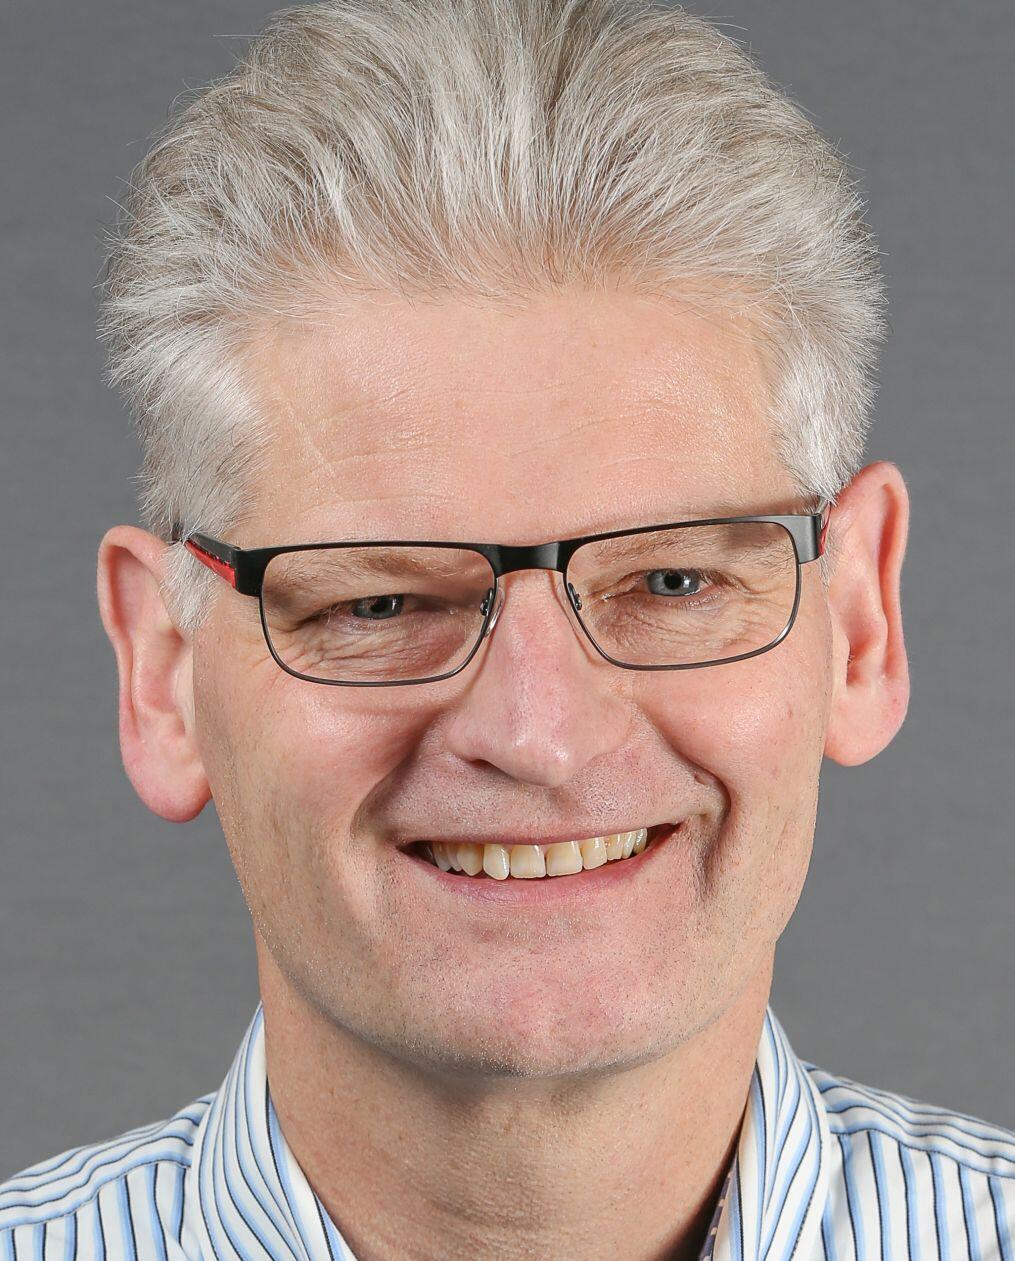 Walter van Steenis